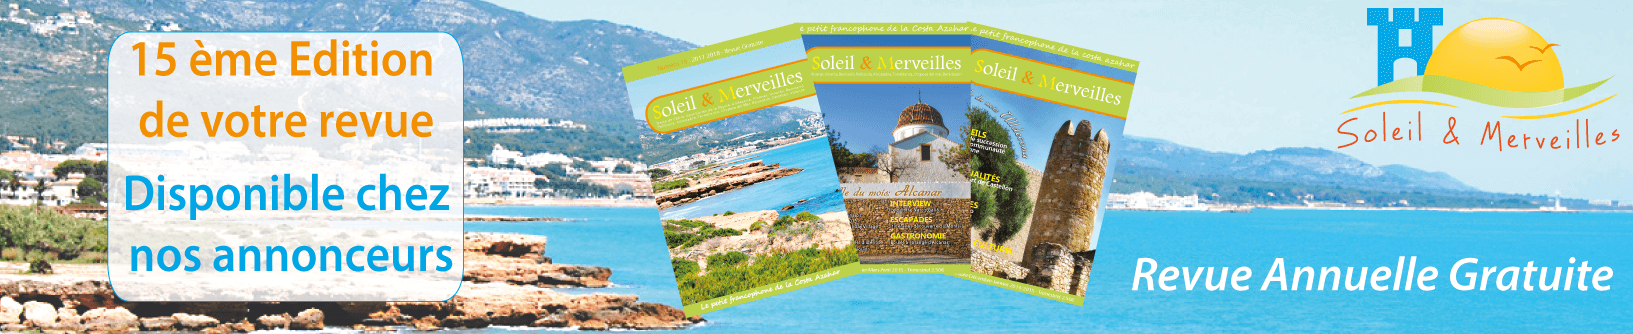 Soleil & Merveilles – Presse Française – Costa Azahar